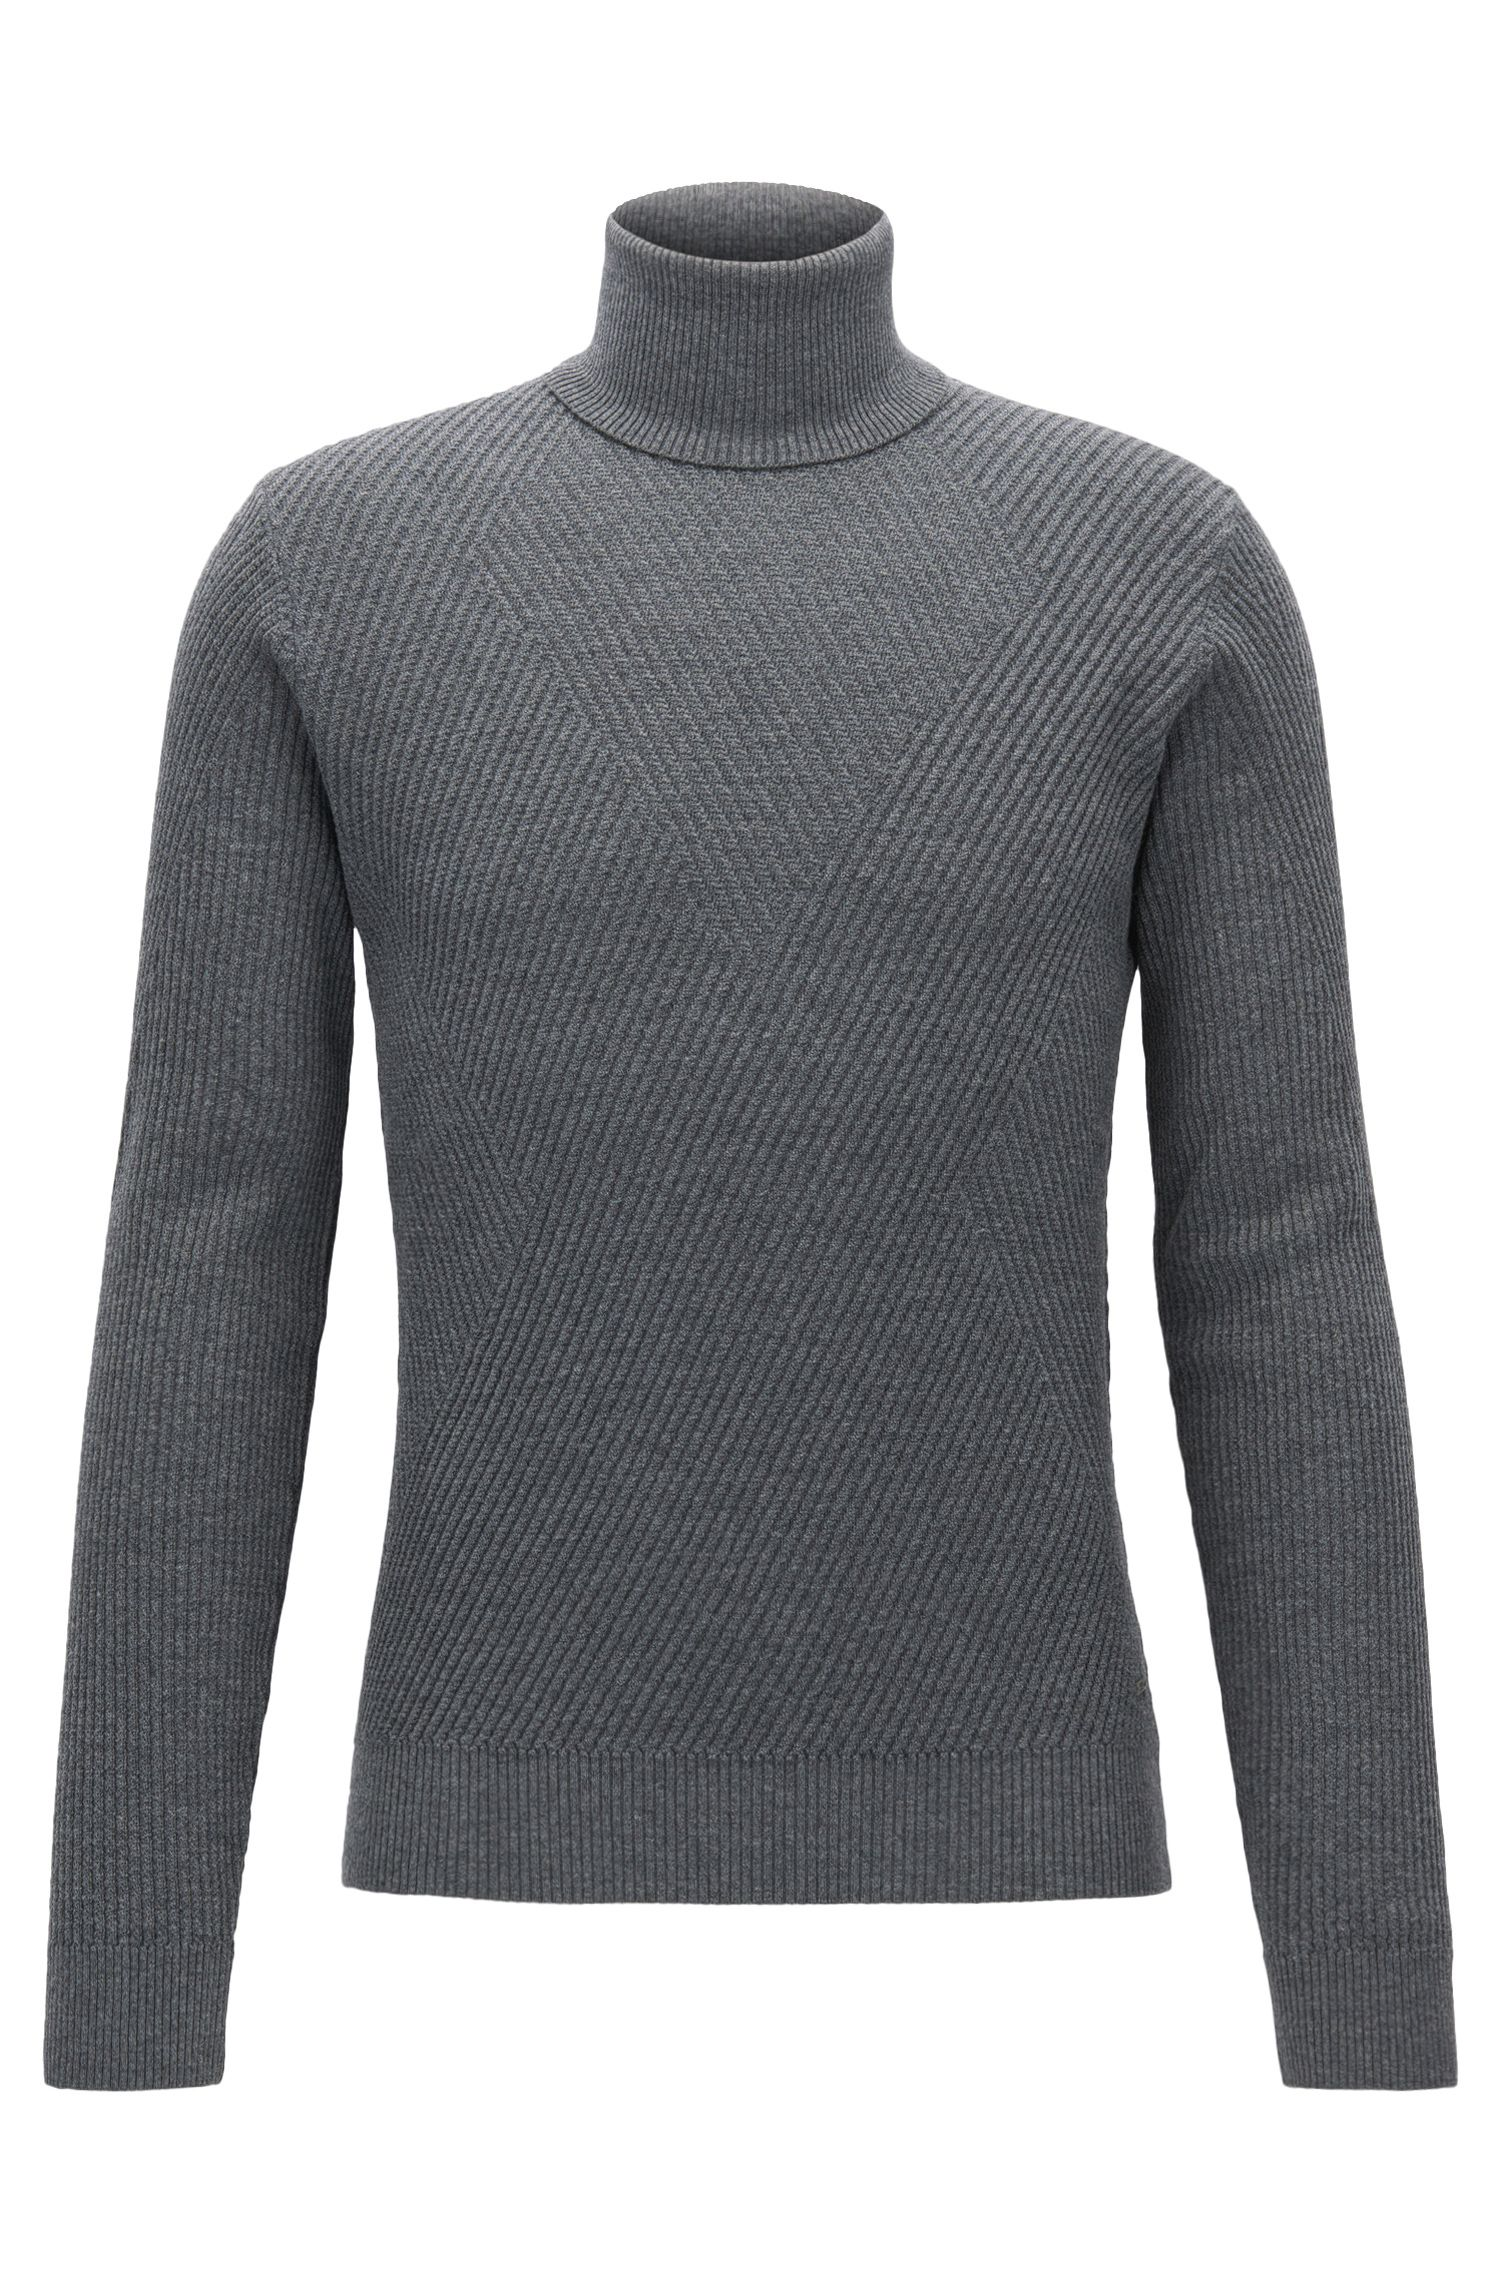 'Nazzaro' | Ribbed Virgin Wool Sweater